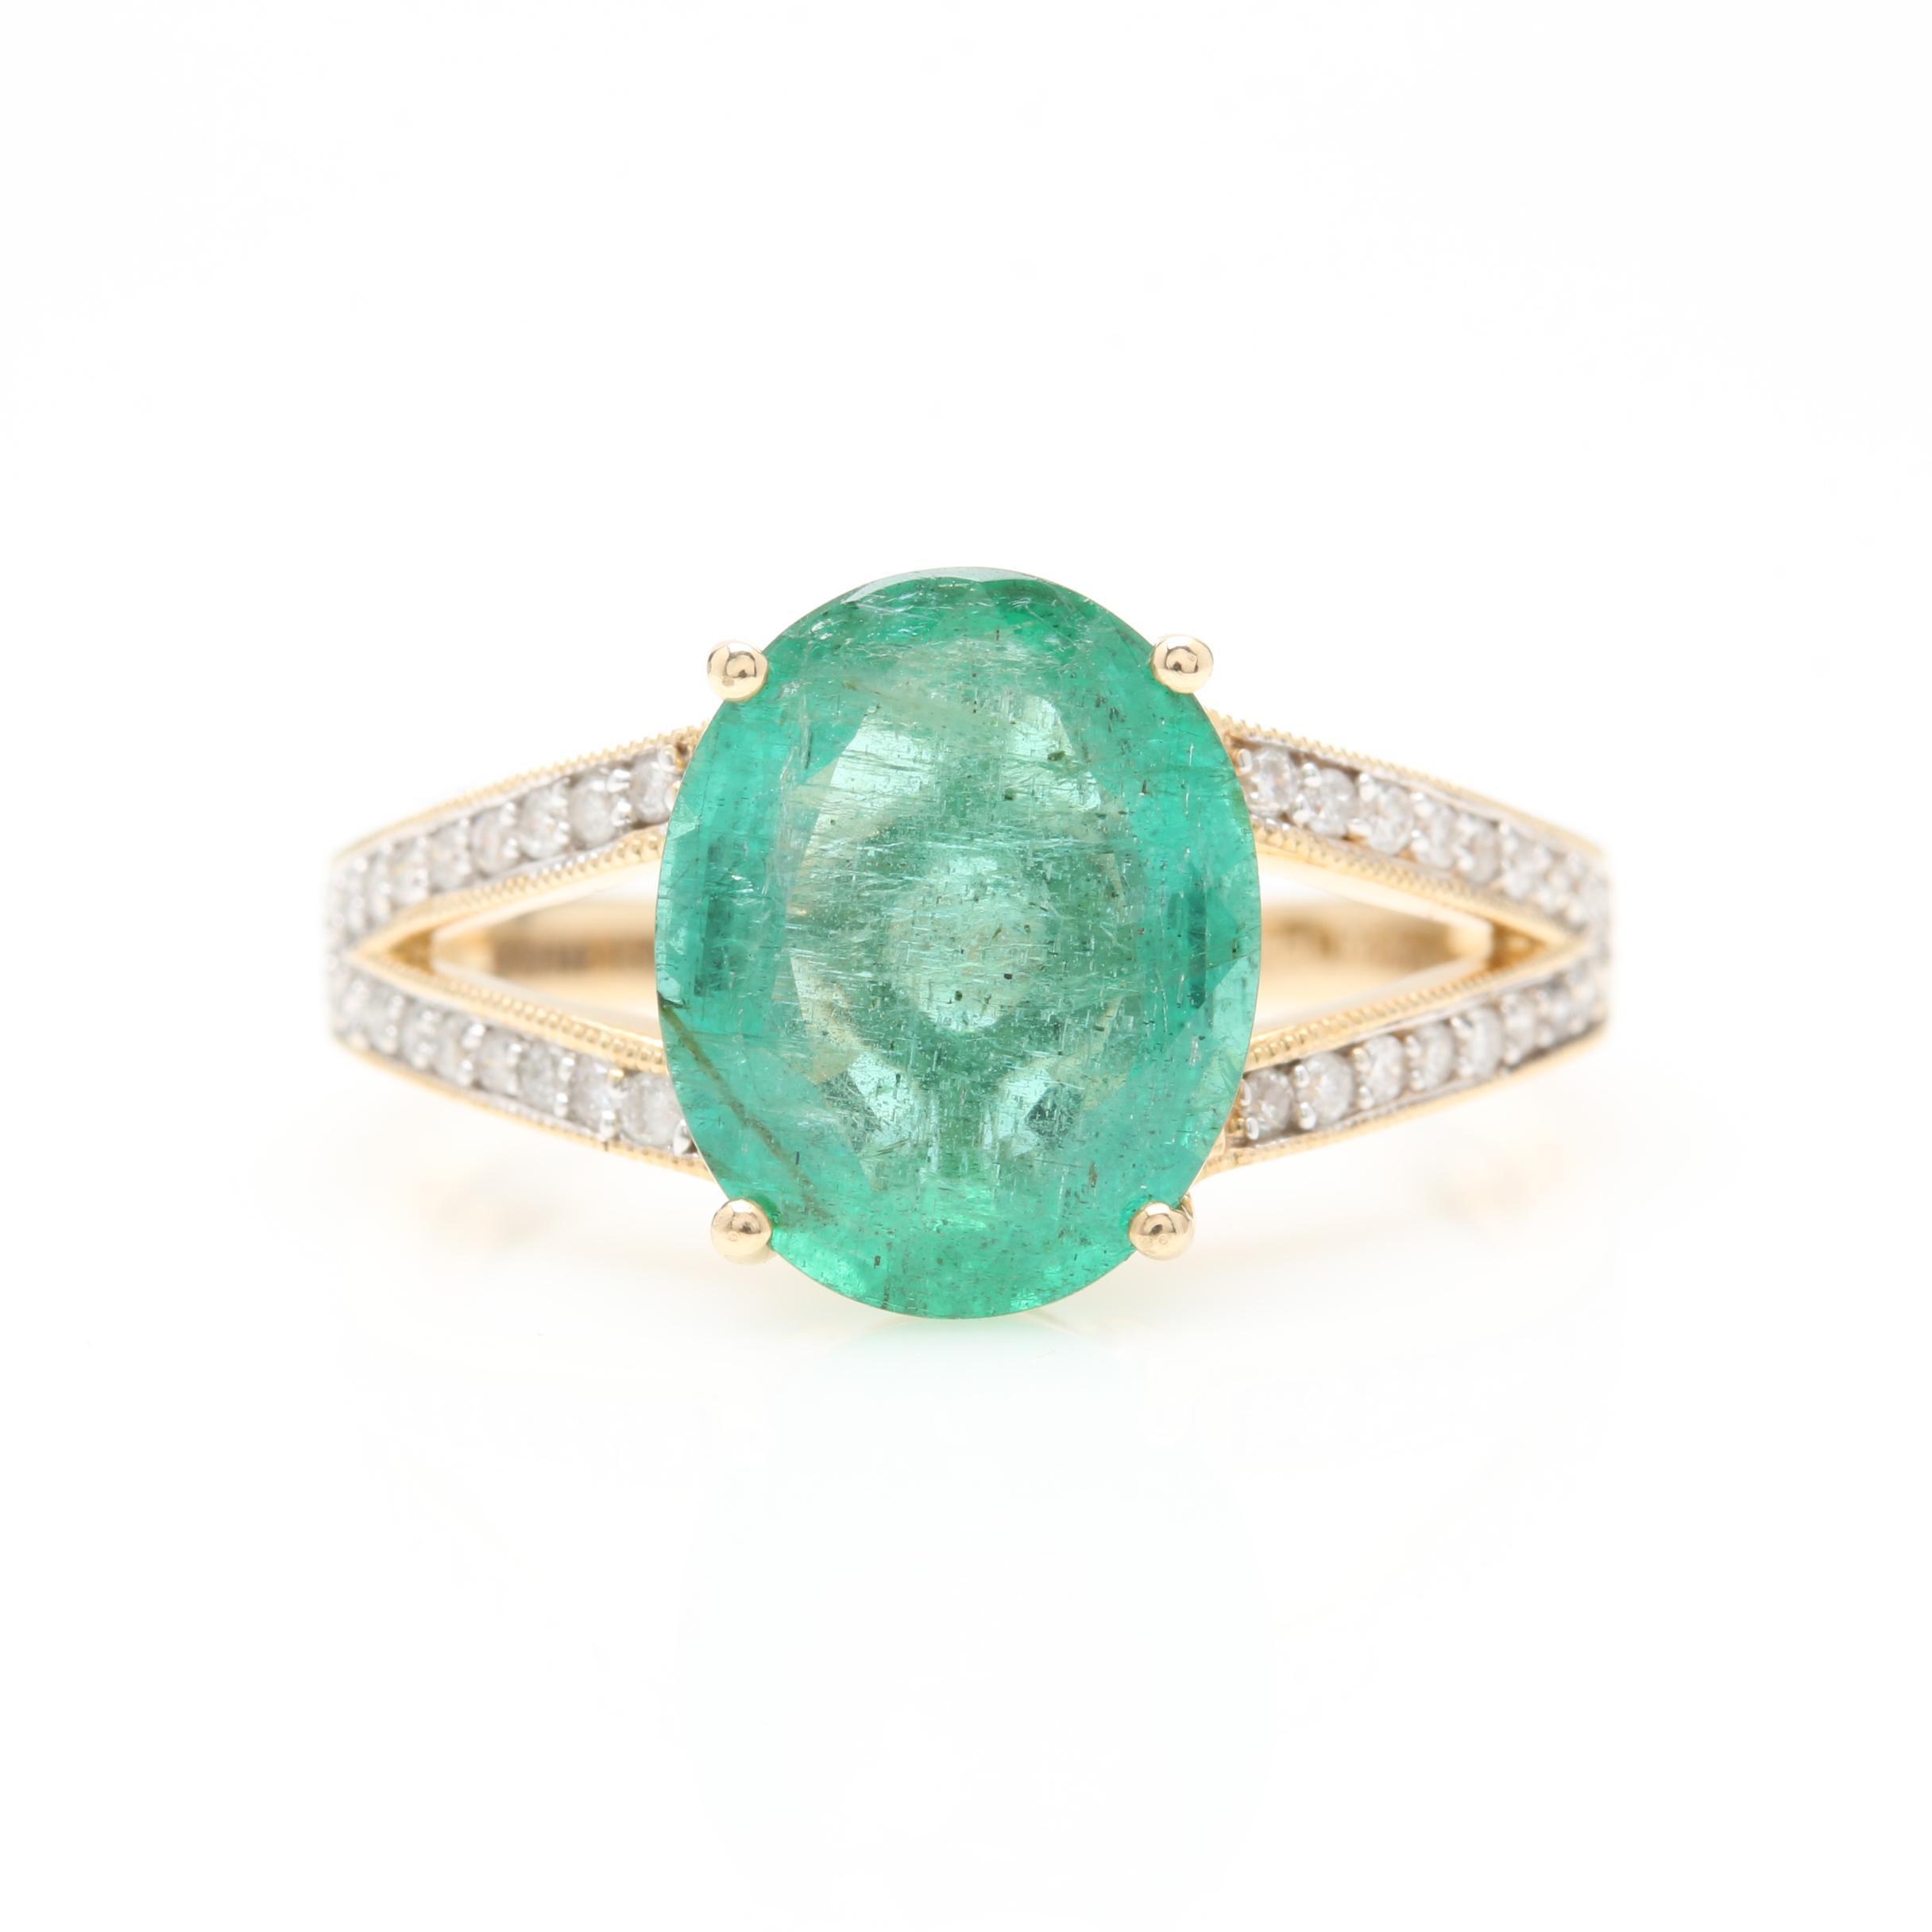 14K Yellow Gold 2.85 CT Emerald and Diamond Ring